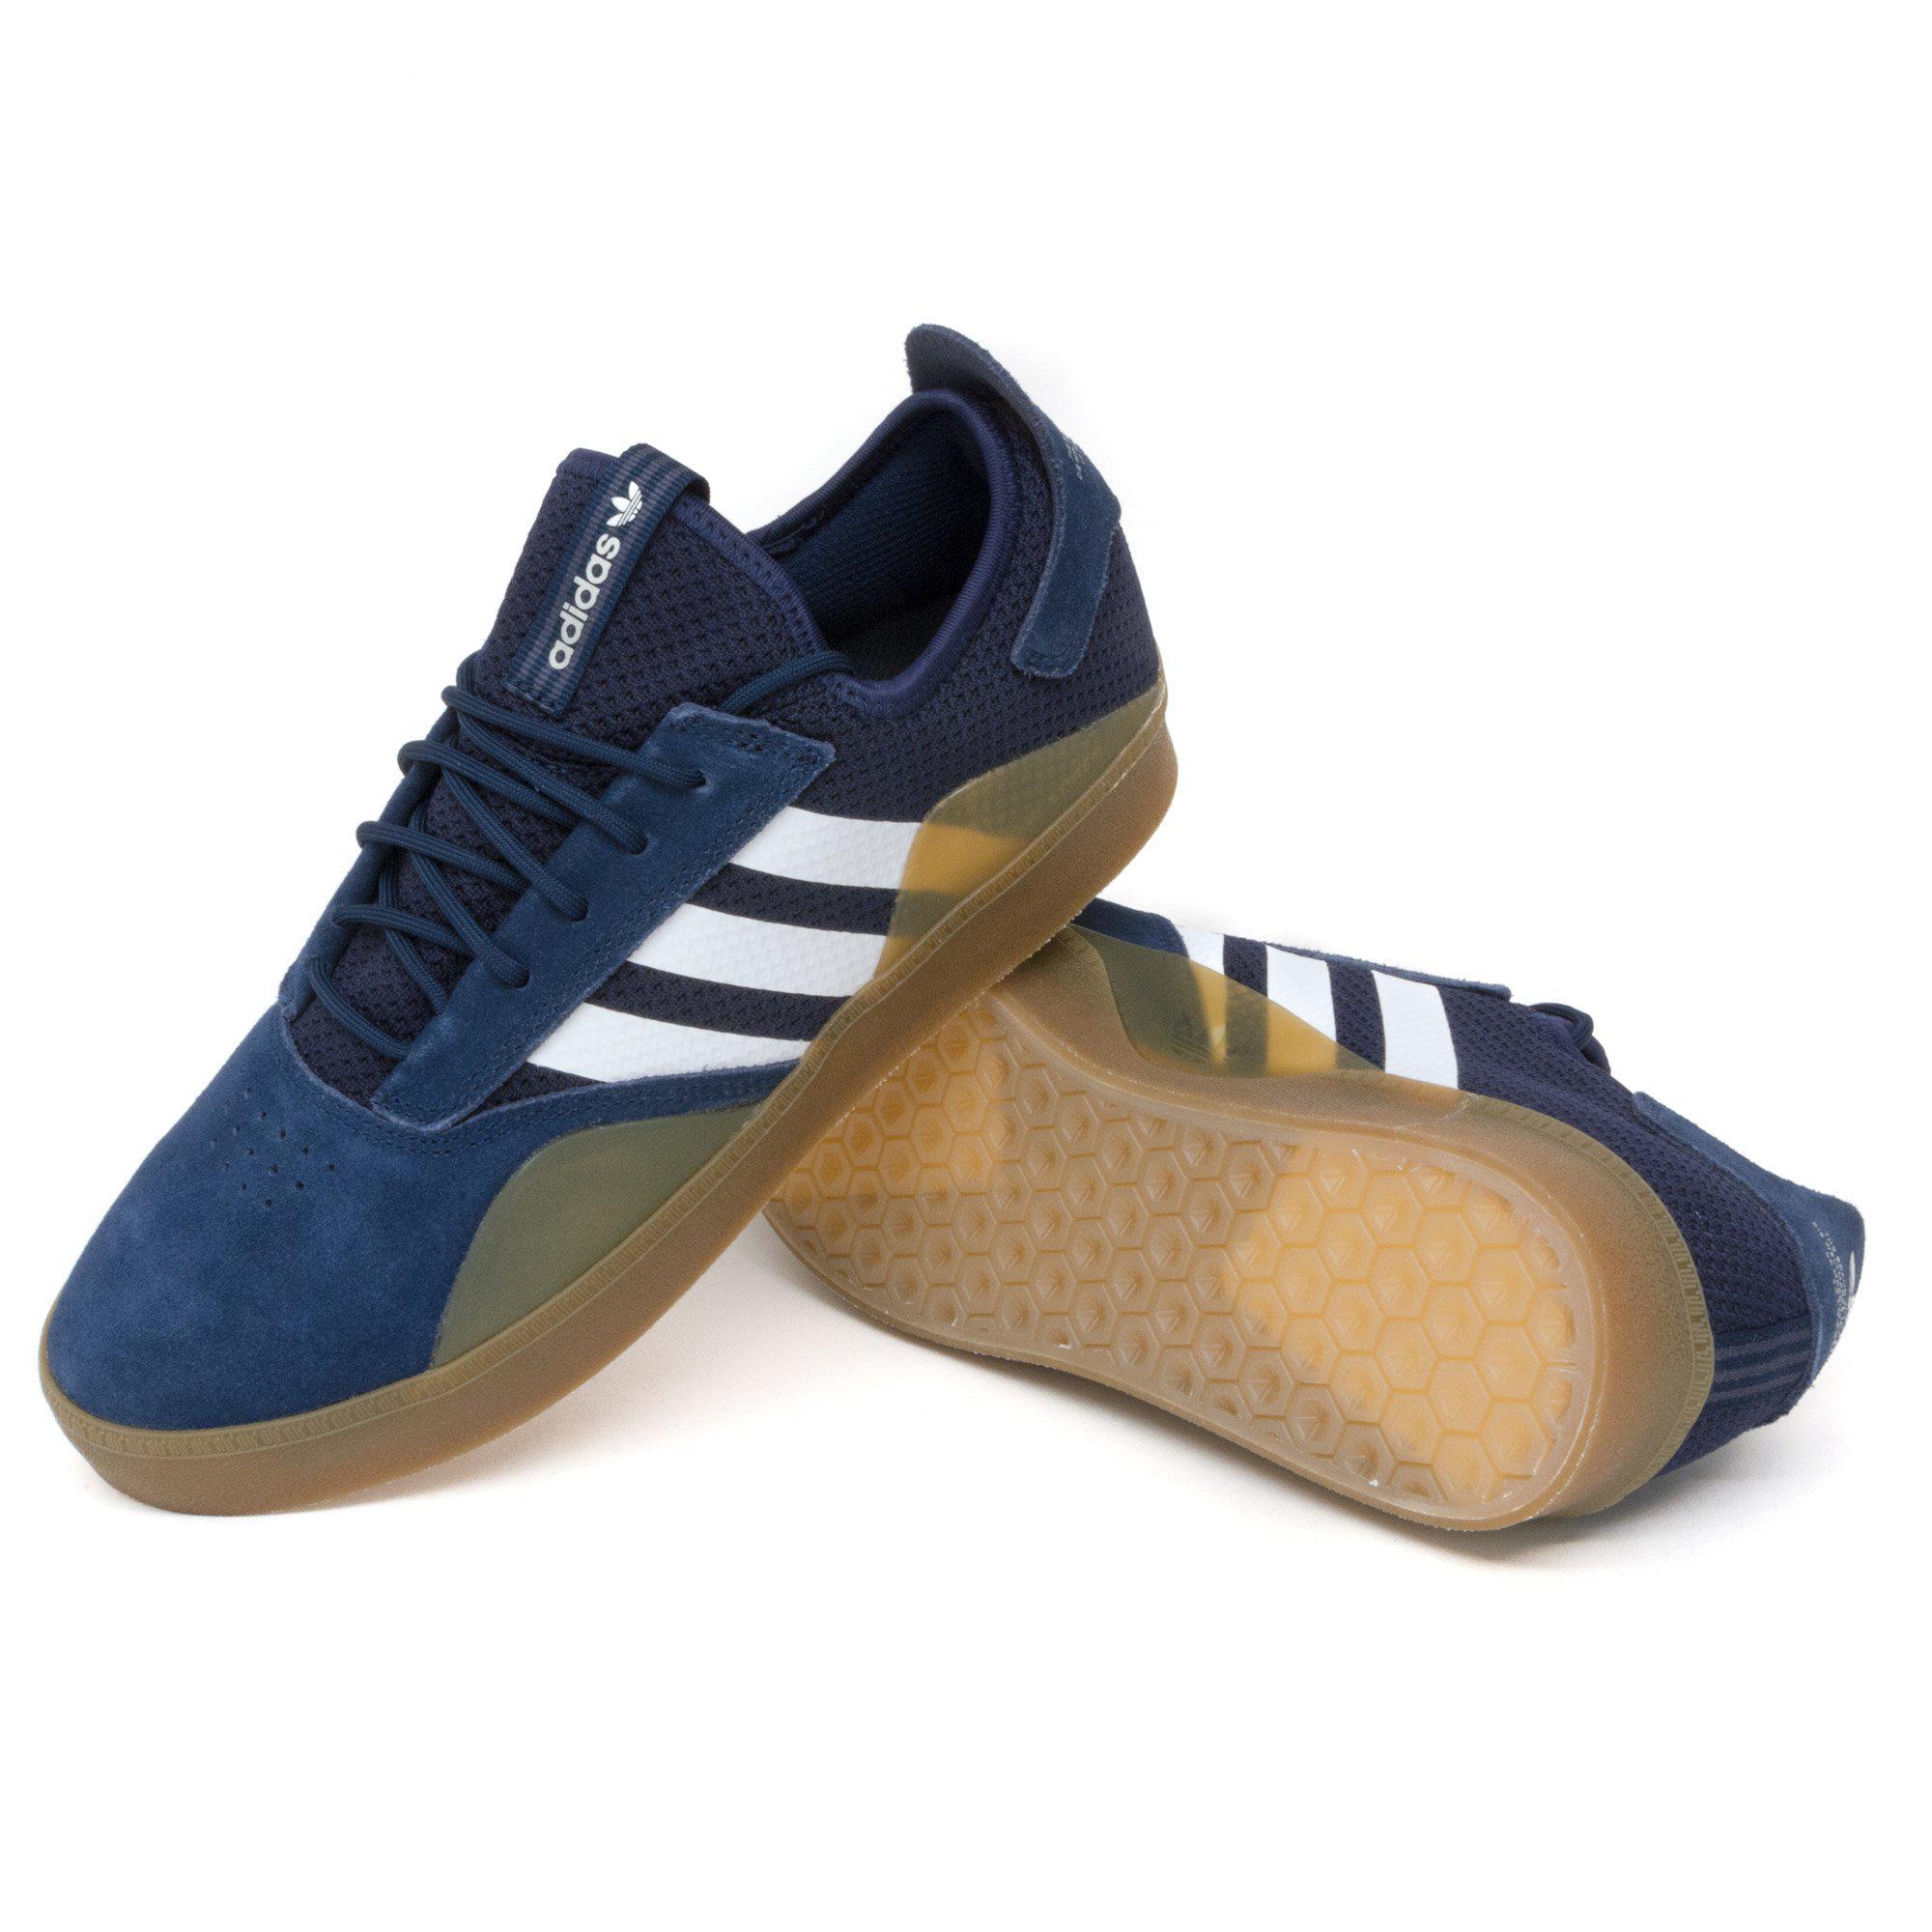 premium selection 138c0 0e299 Adidas - Blue 3st.001 Shoes for Men - Lyst. View fullscreen